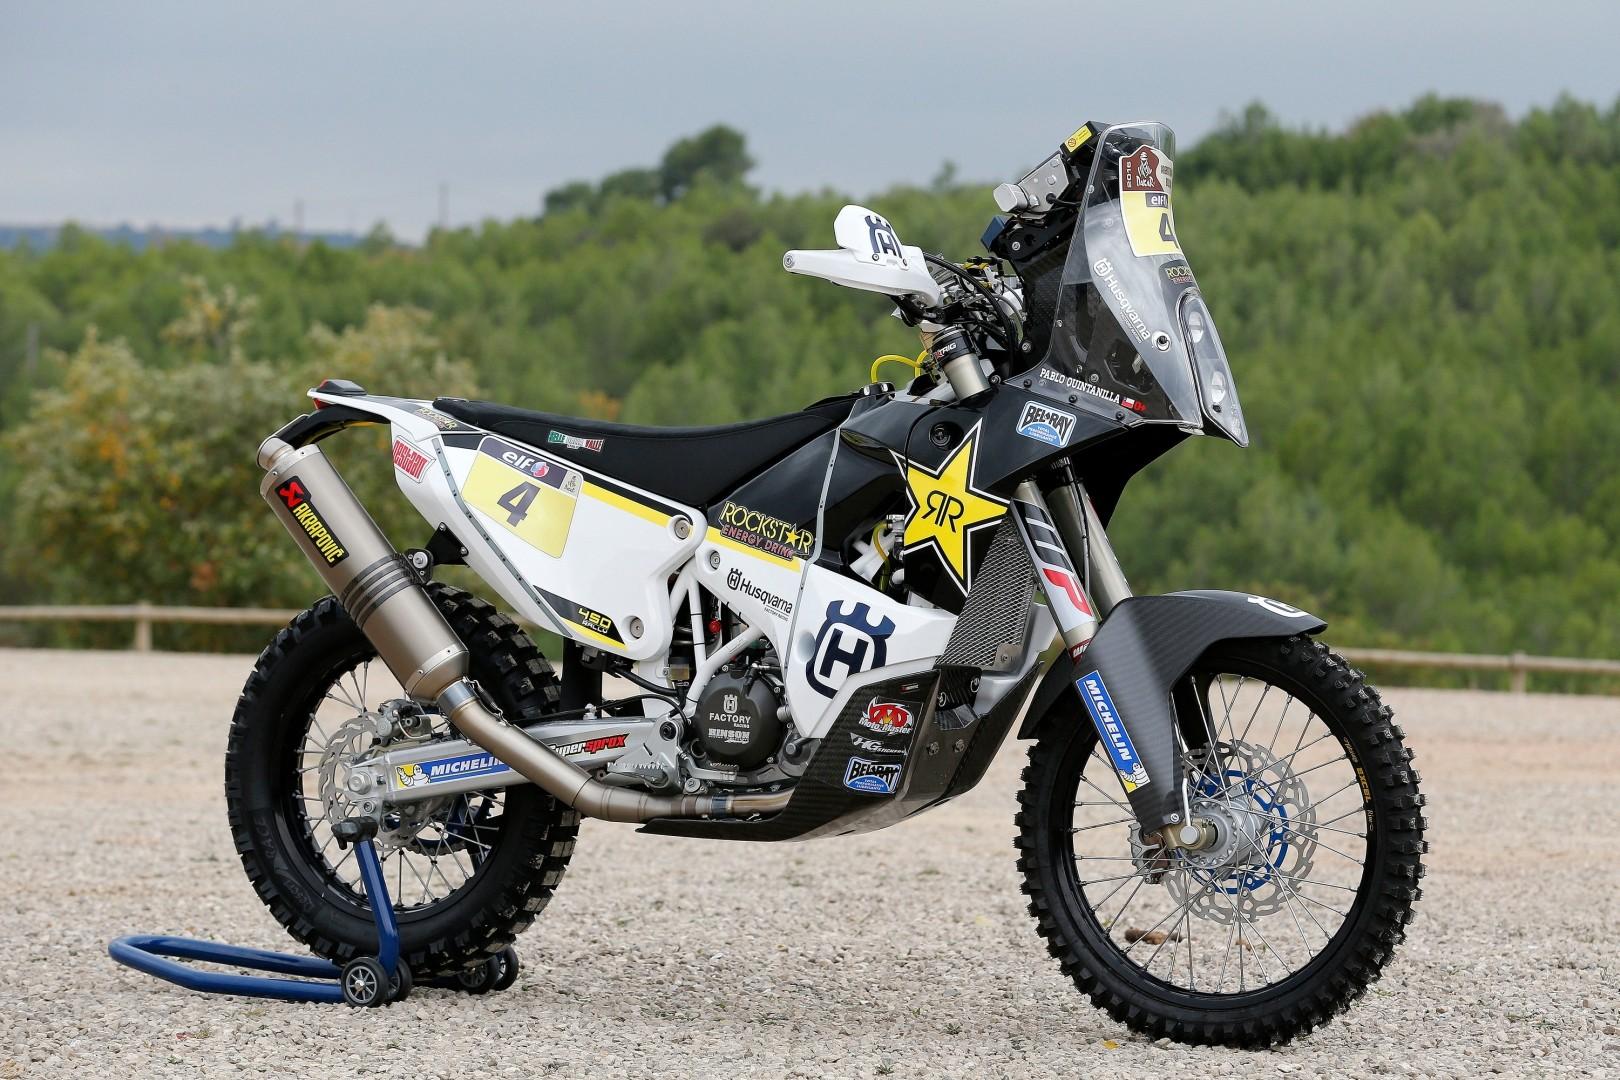 Husqvarna Introduces the Dakar Team and the Bikes - autoevolution